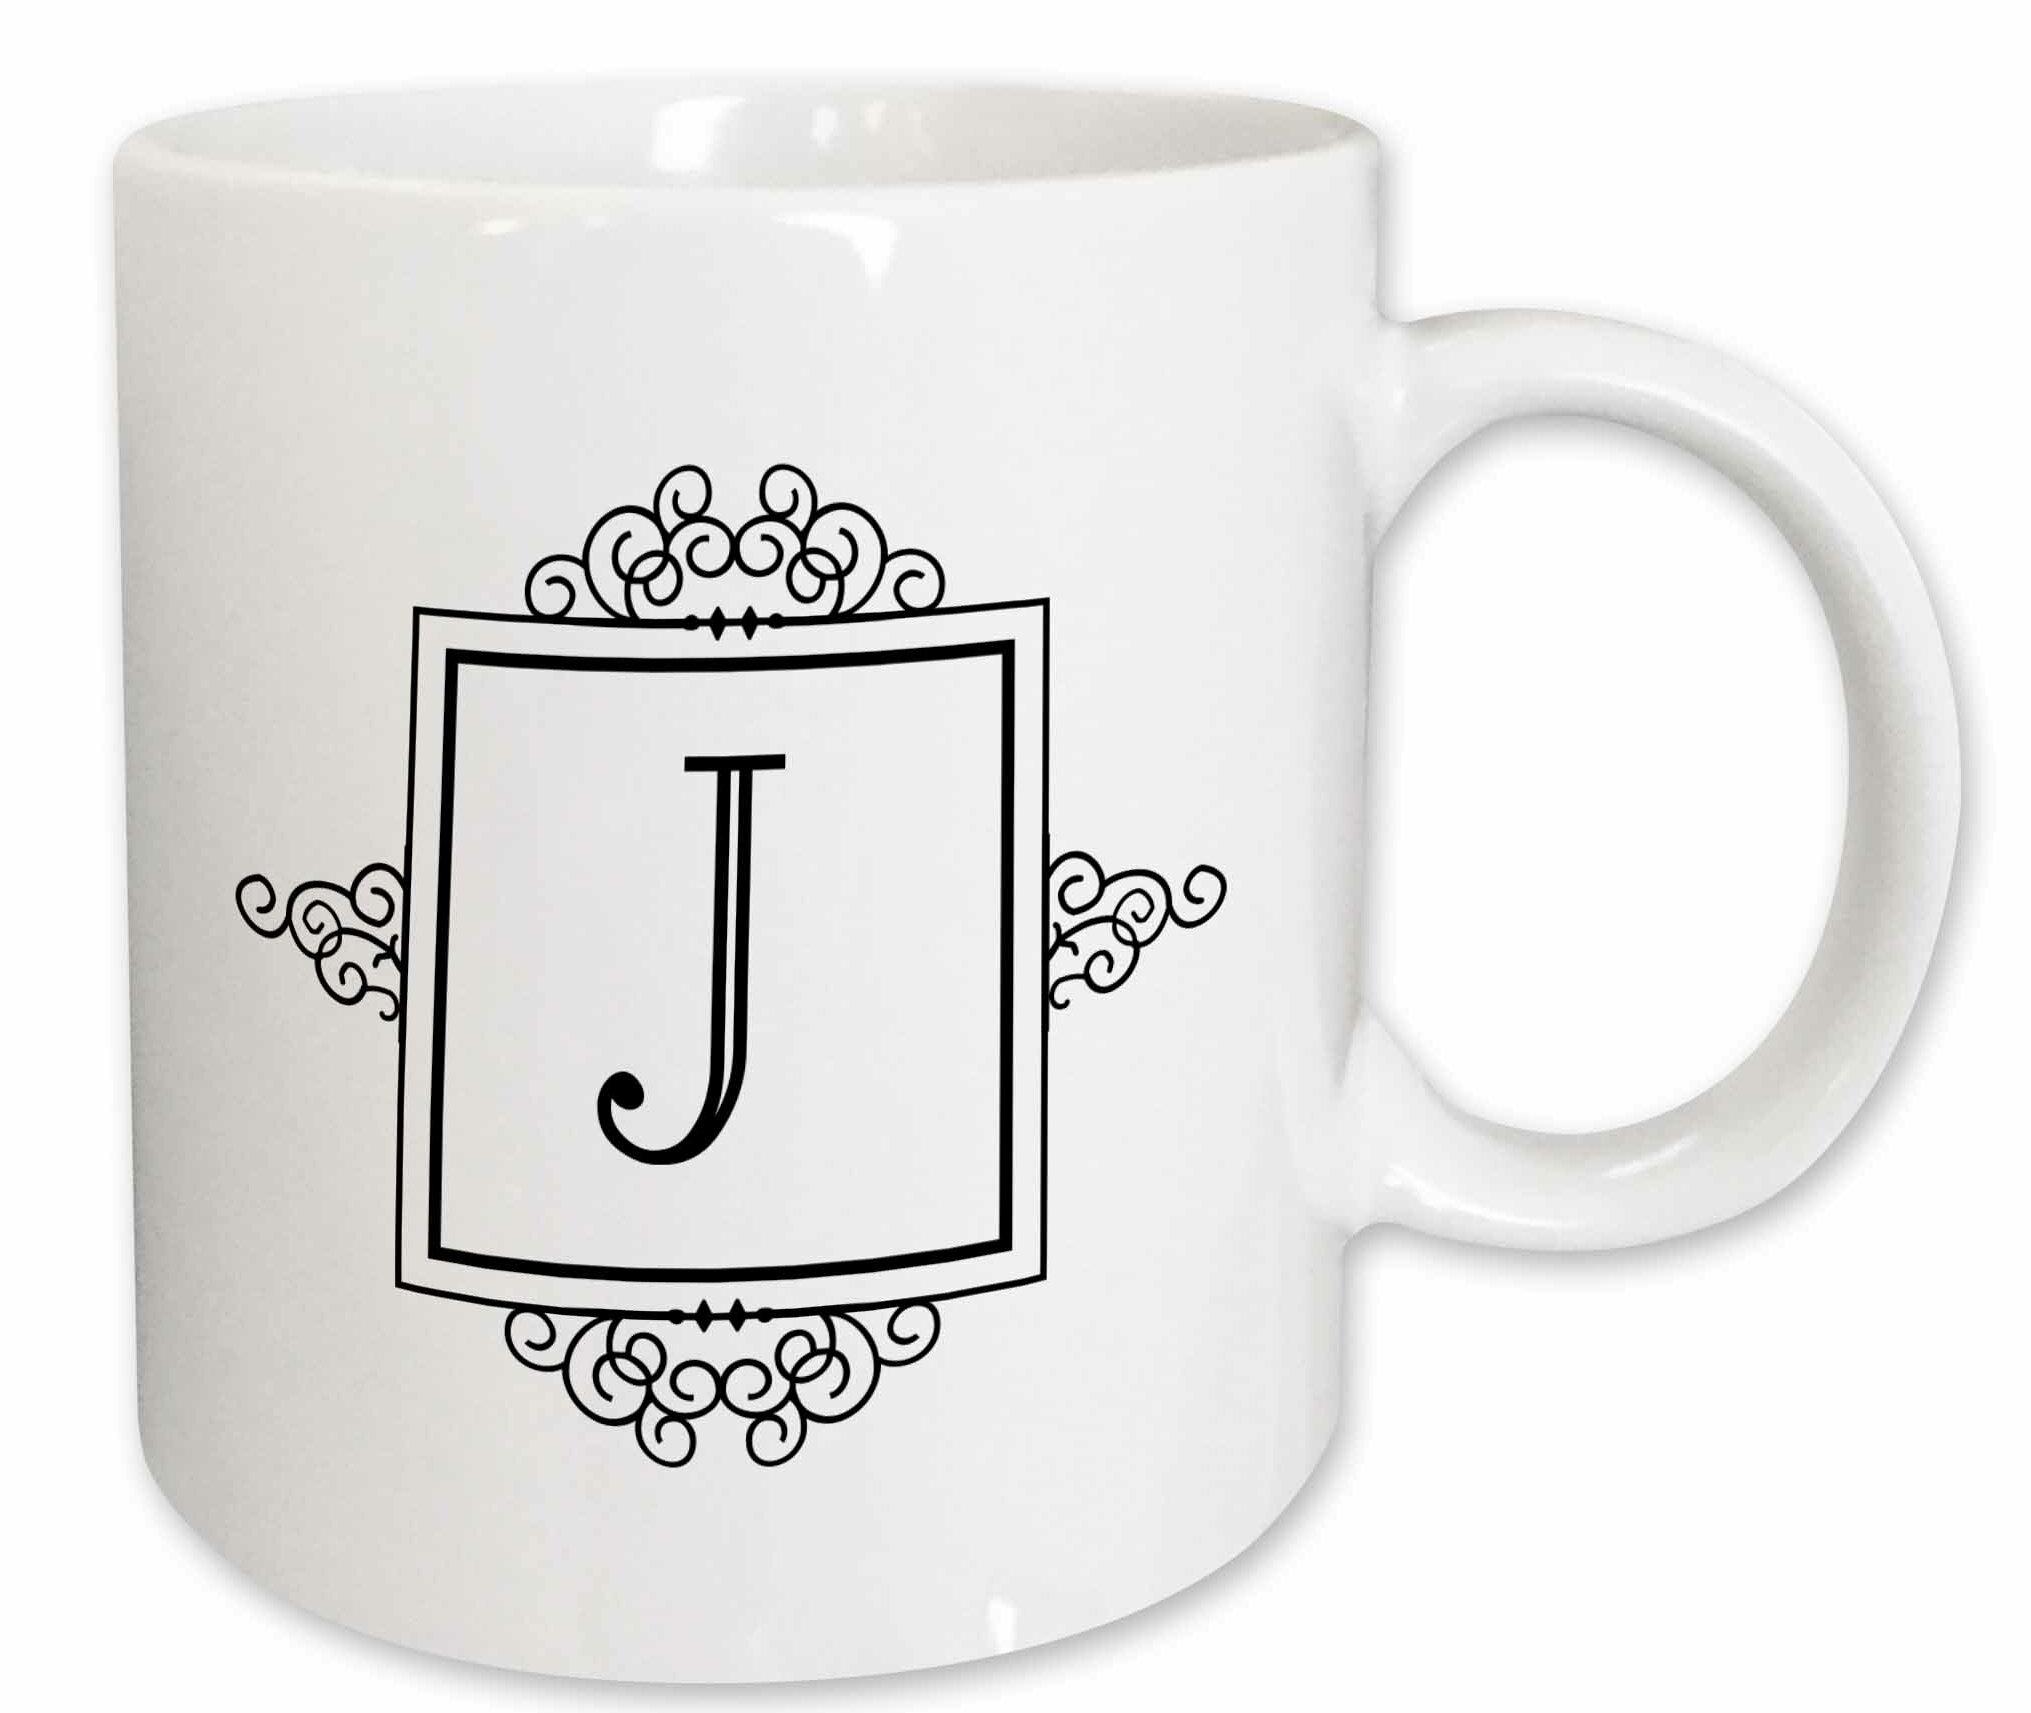 3drose Initial Letter J Personal Monogrammed Fancy Typography Elegant Stylish Personalized Coffee Mug Wayfair